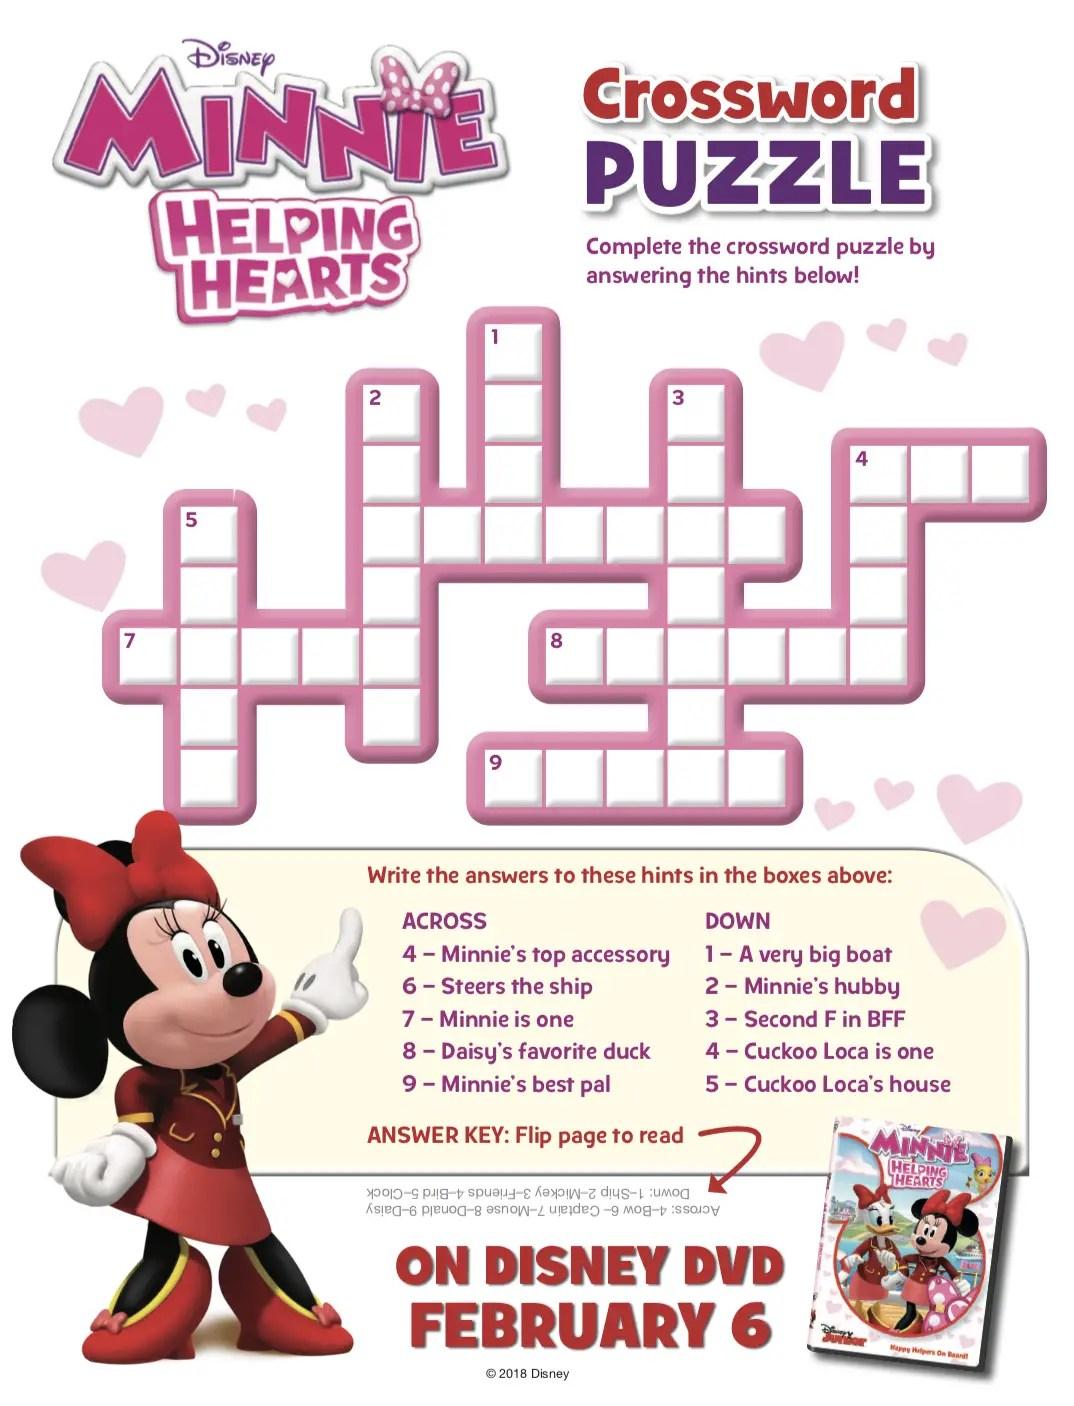 11 Fun Disney Crossword Puzzles